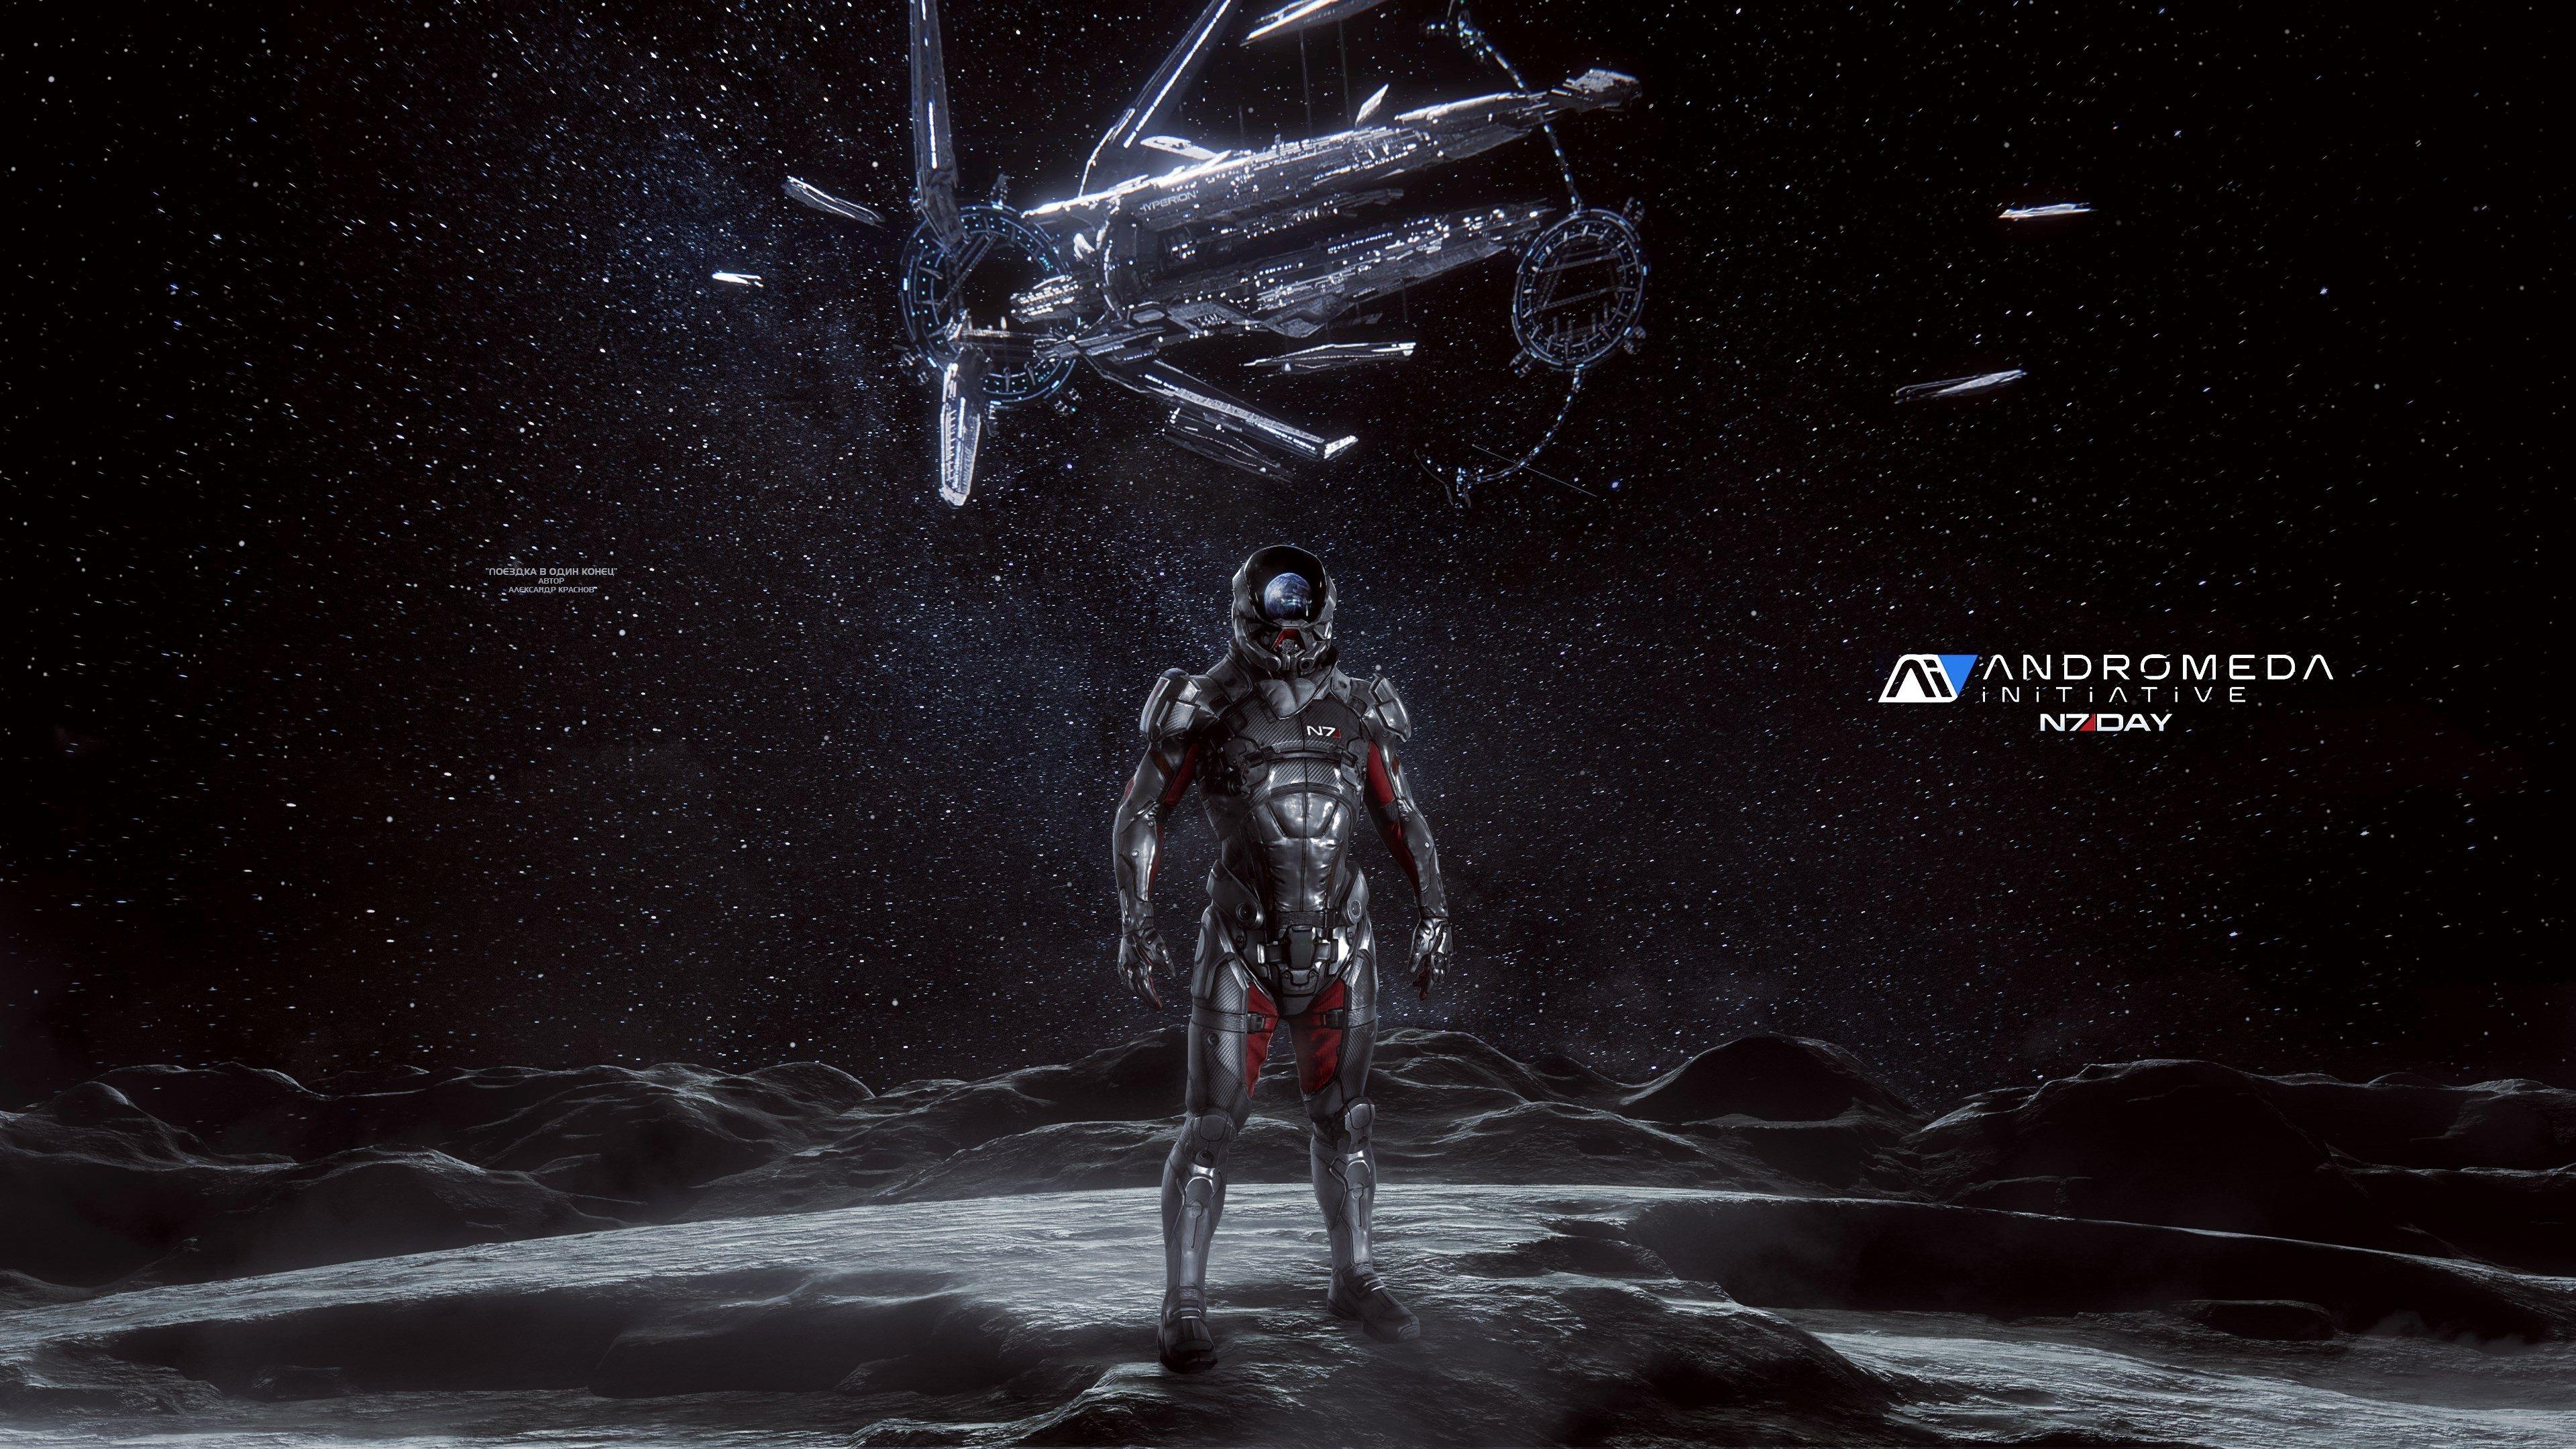 3840x2160 Mass Effect Andromeda 4k High Res Wallpaper Mass Effect Wallpaper Backgrounds Mass Effect Characters